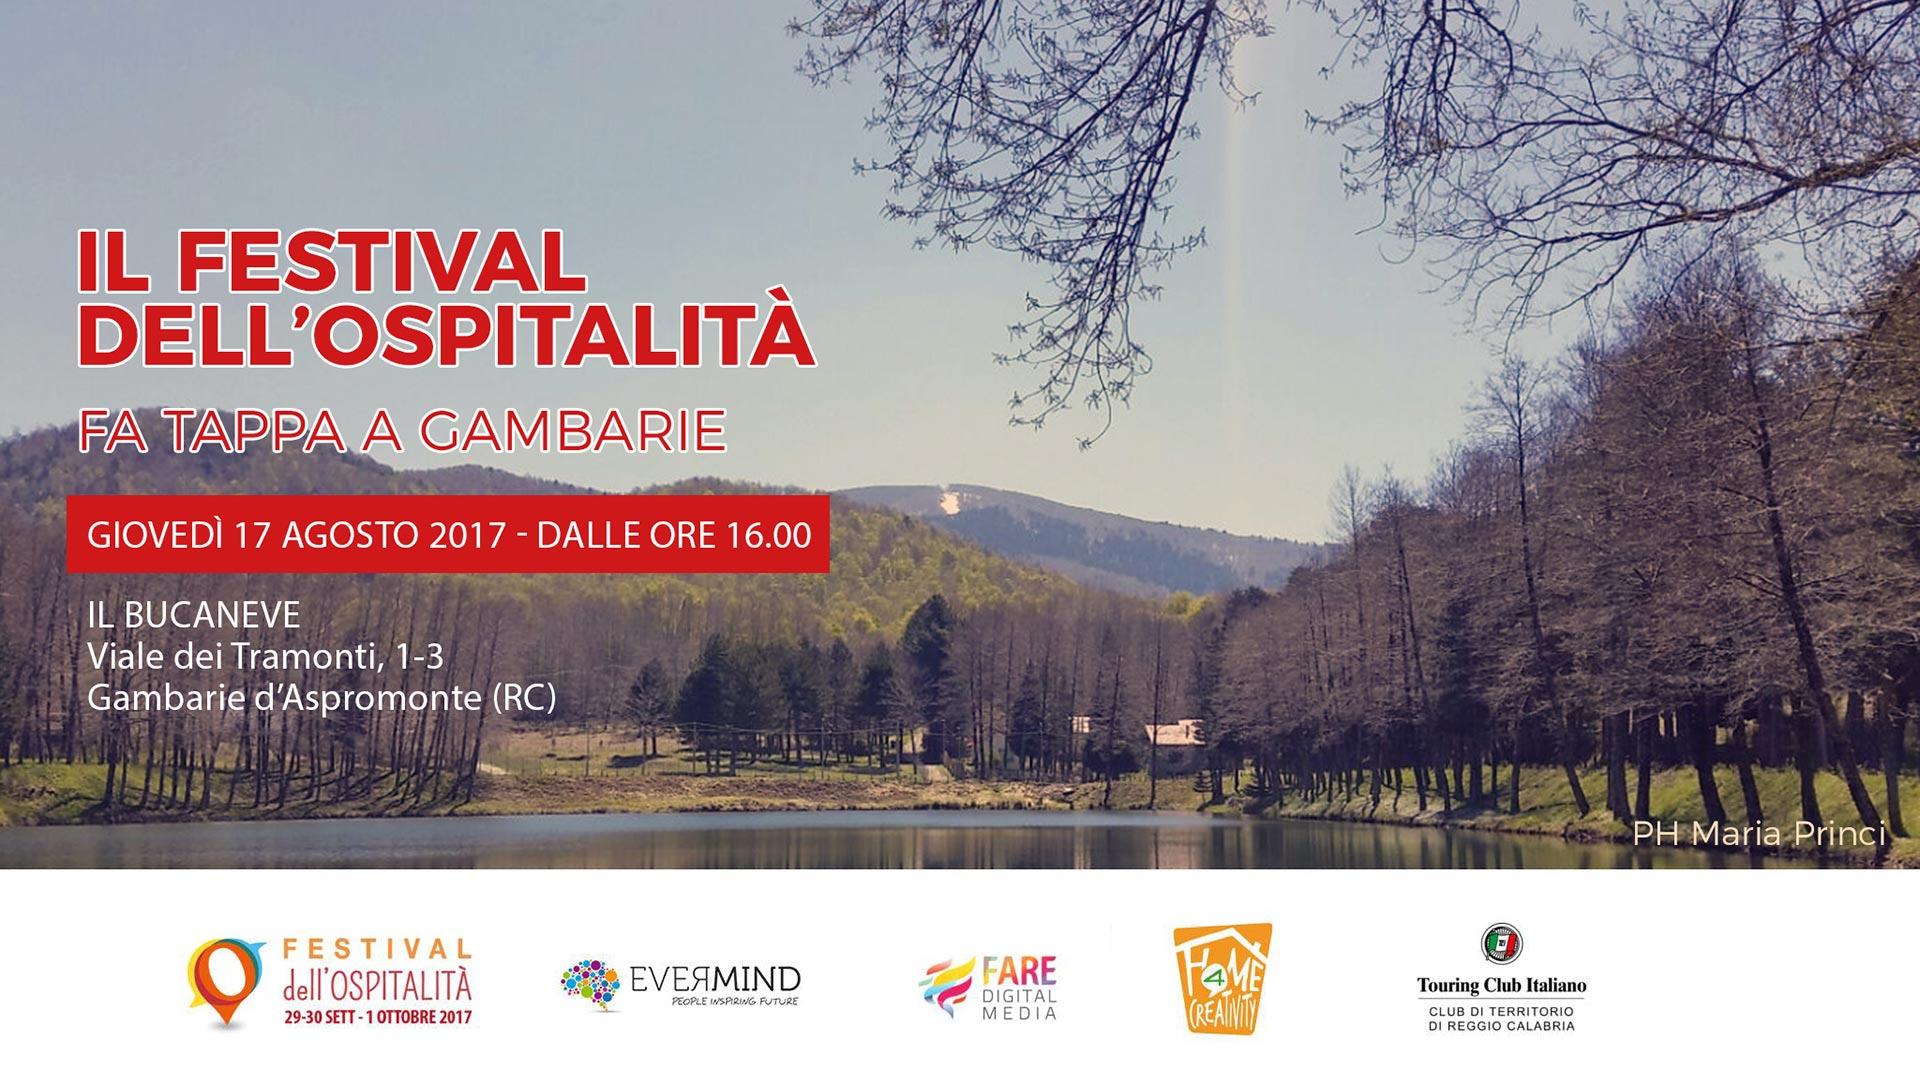 festival-ospitalita-gambarie-facebook-cover